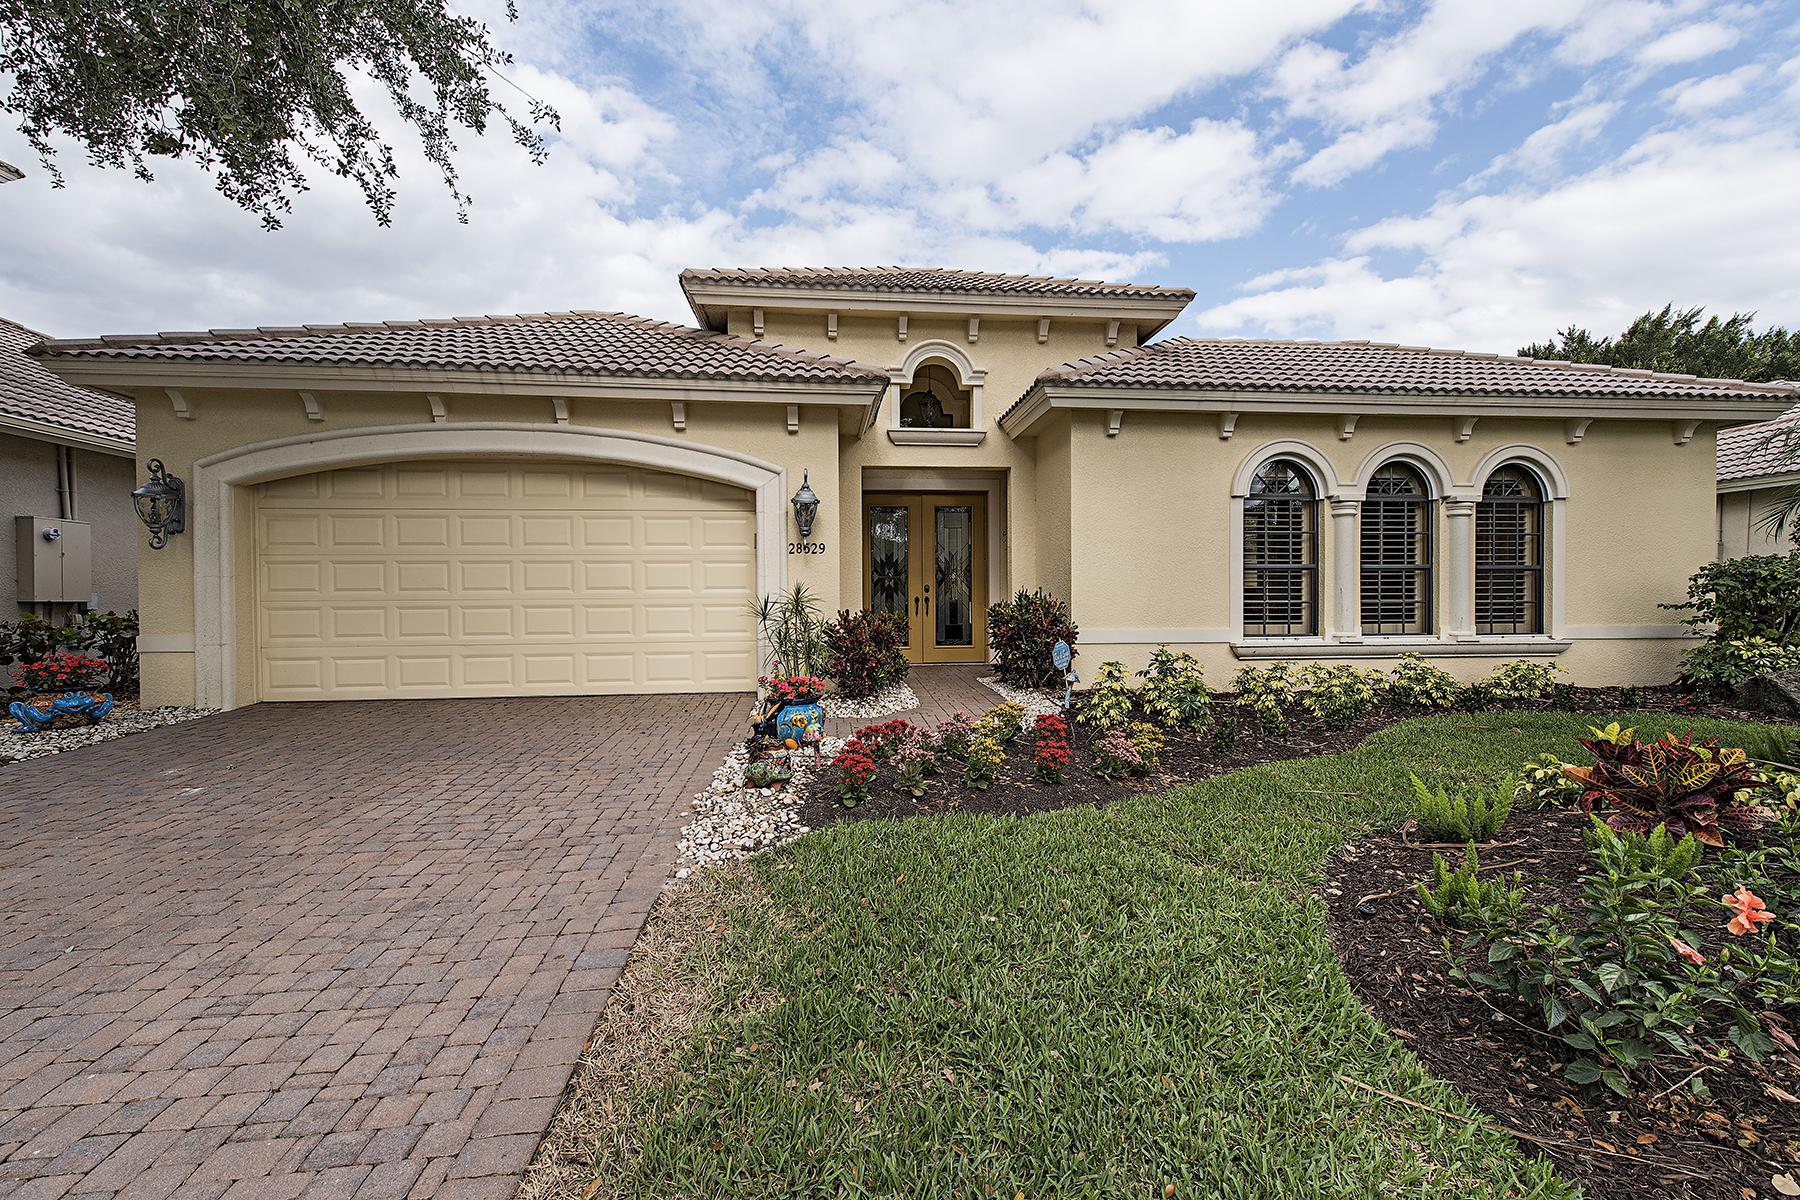 独户住宅 为 销售 在 PALMIRA GOLF AND COUNTRY CLUB - VILLA TUSCANY 28529 Azzili Way 博尼塔温泉, 佛罗里达州, 34135 美国